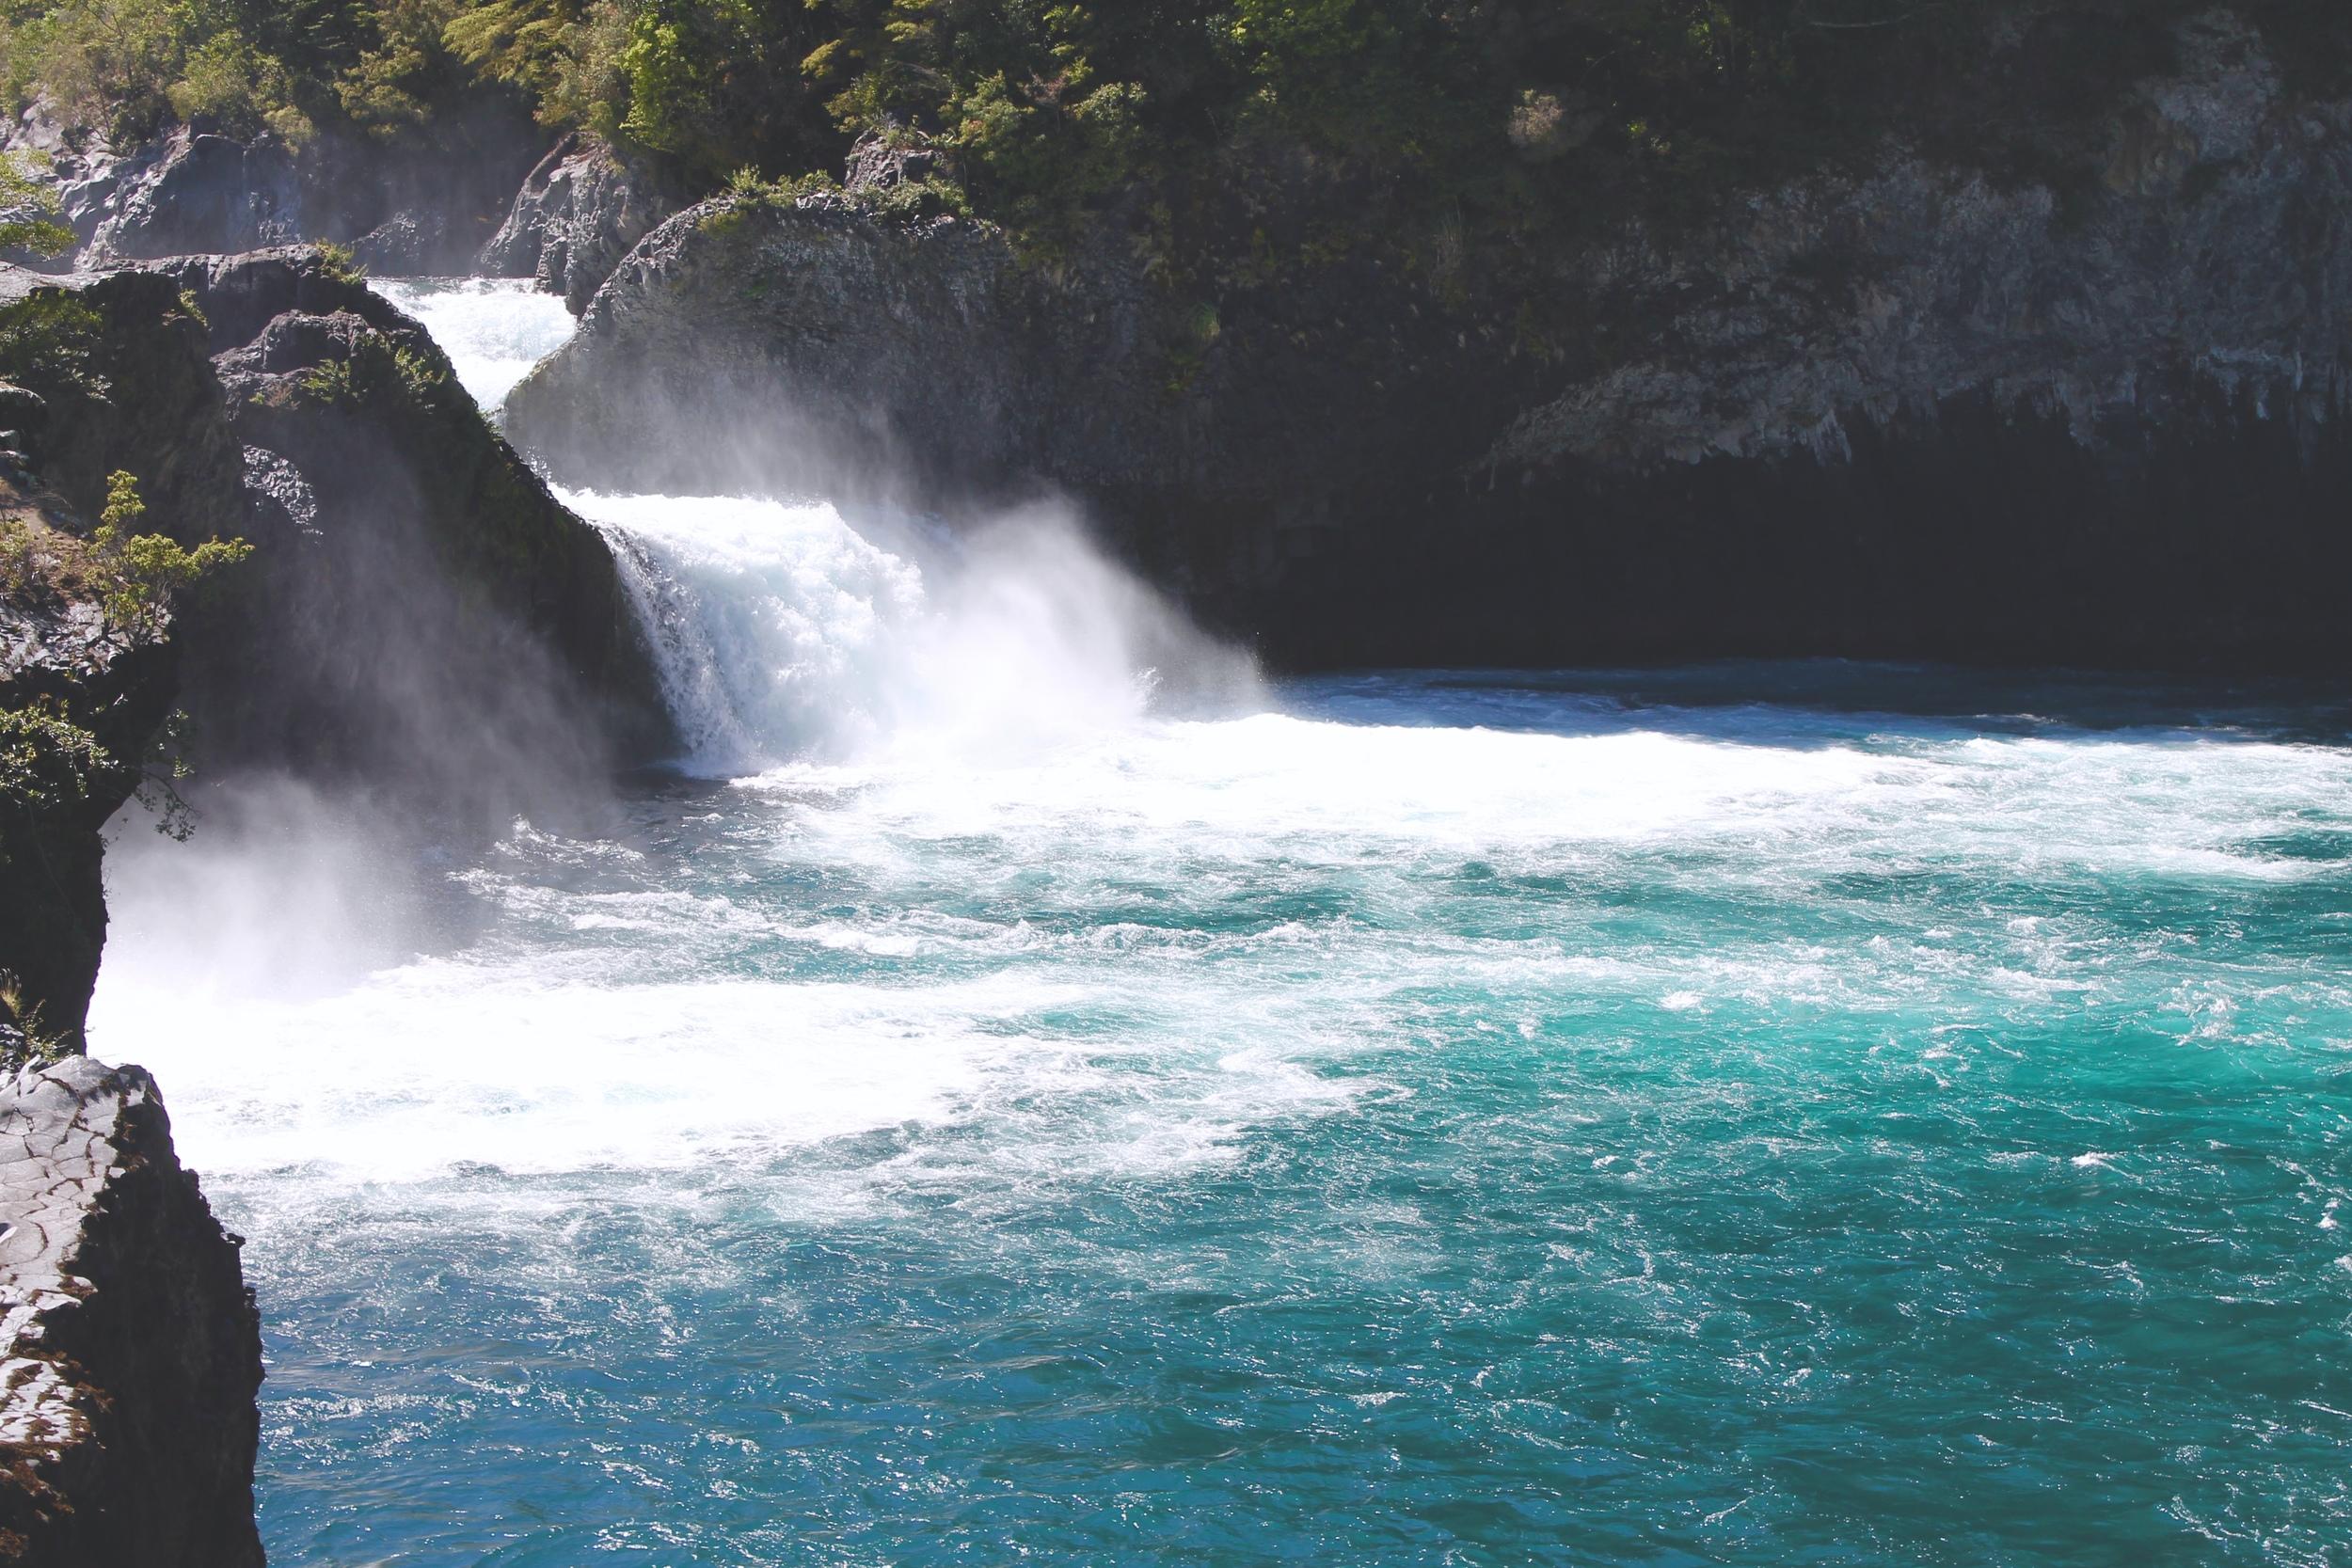 Puyehue Waterfall